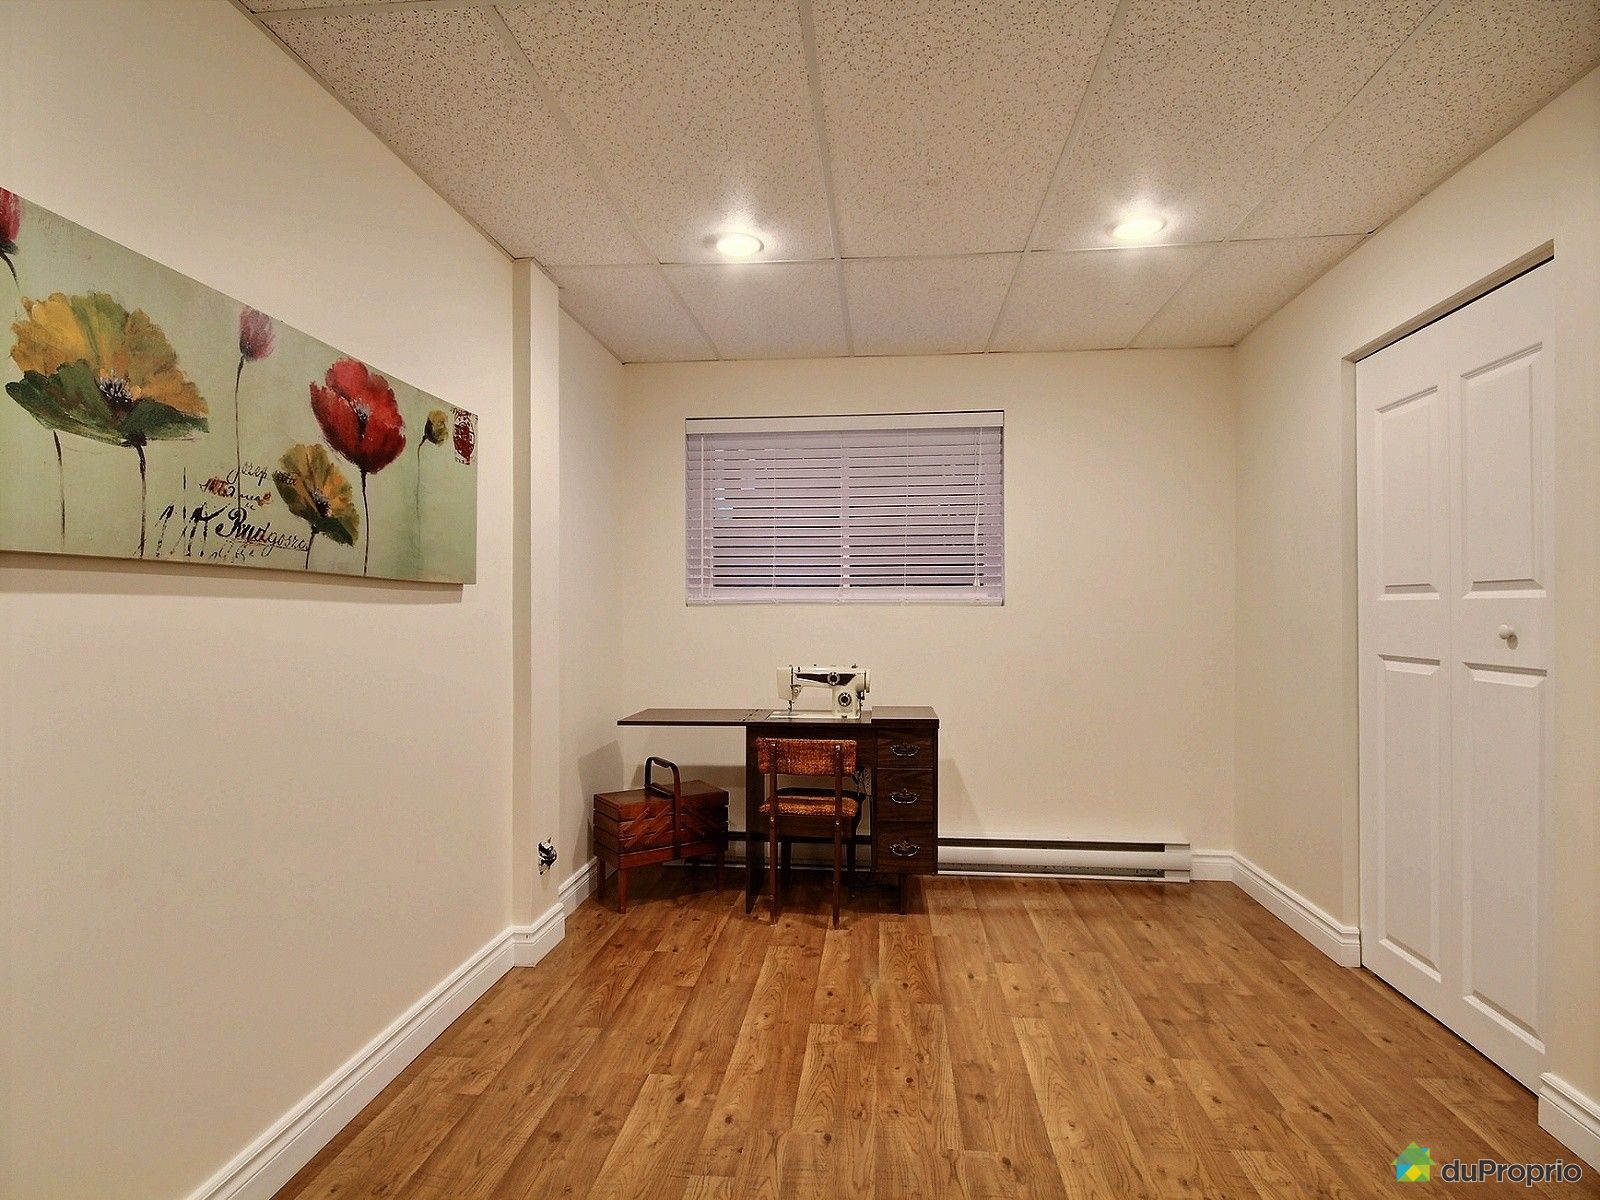 maison vendu longueuil immobilier qu bec duproprio 683636. Black Bedroom Furniture Sets. Home Design Ideas